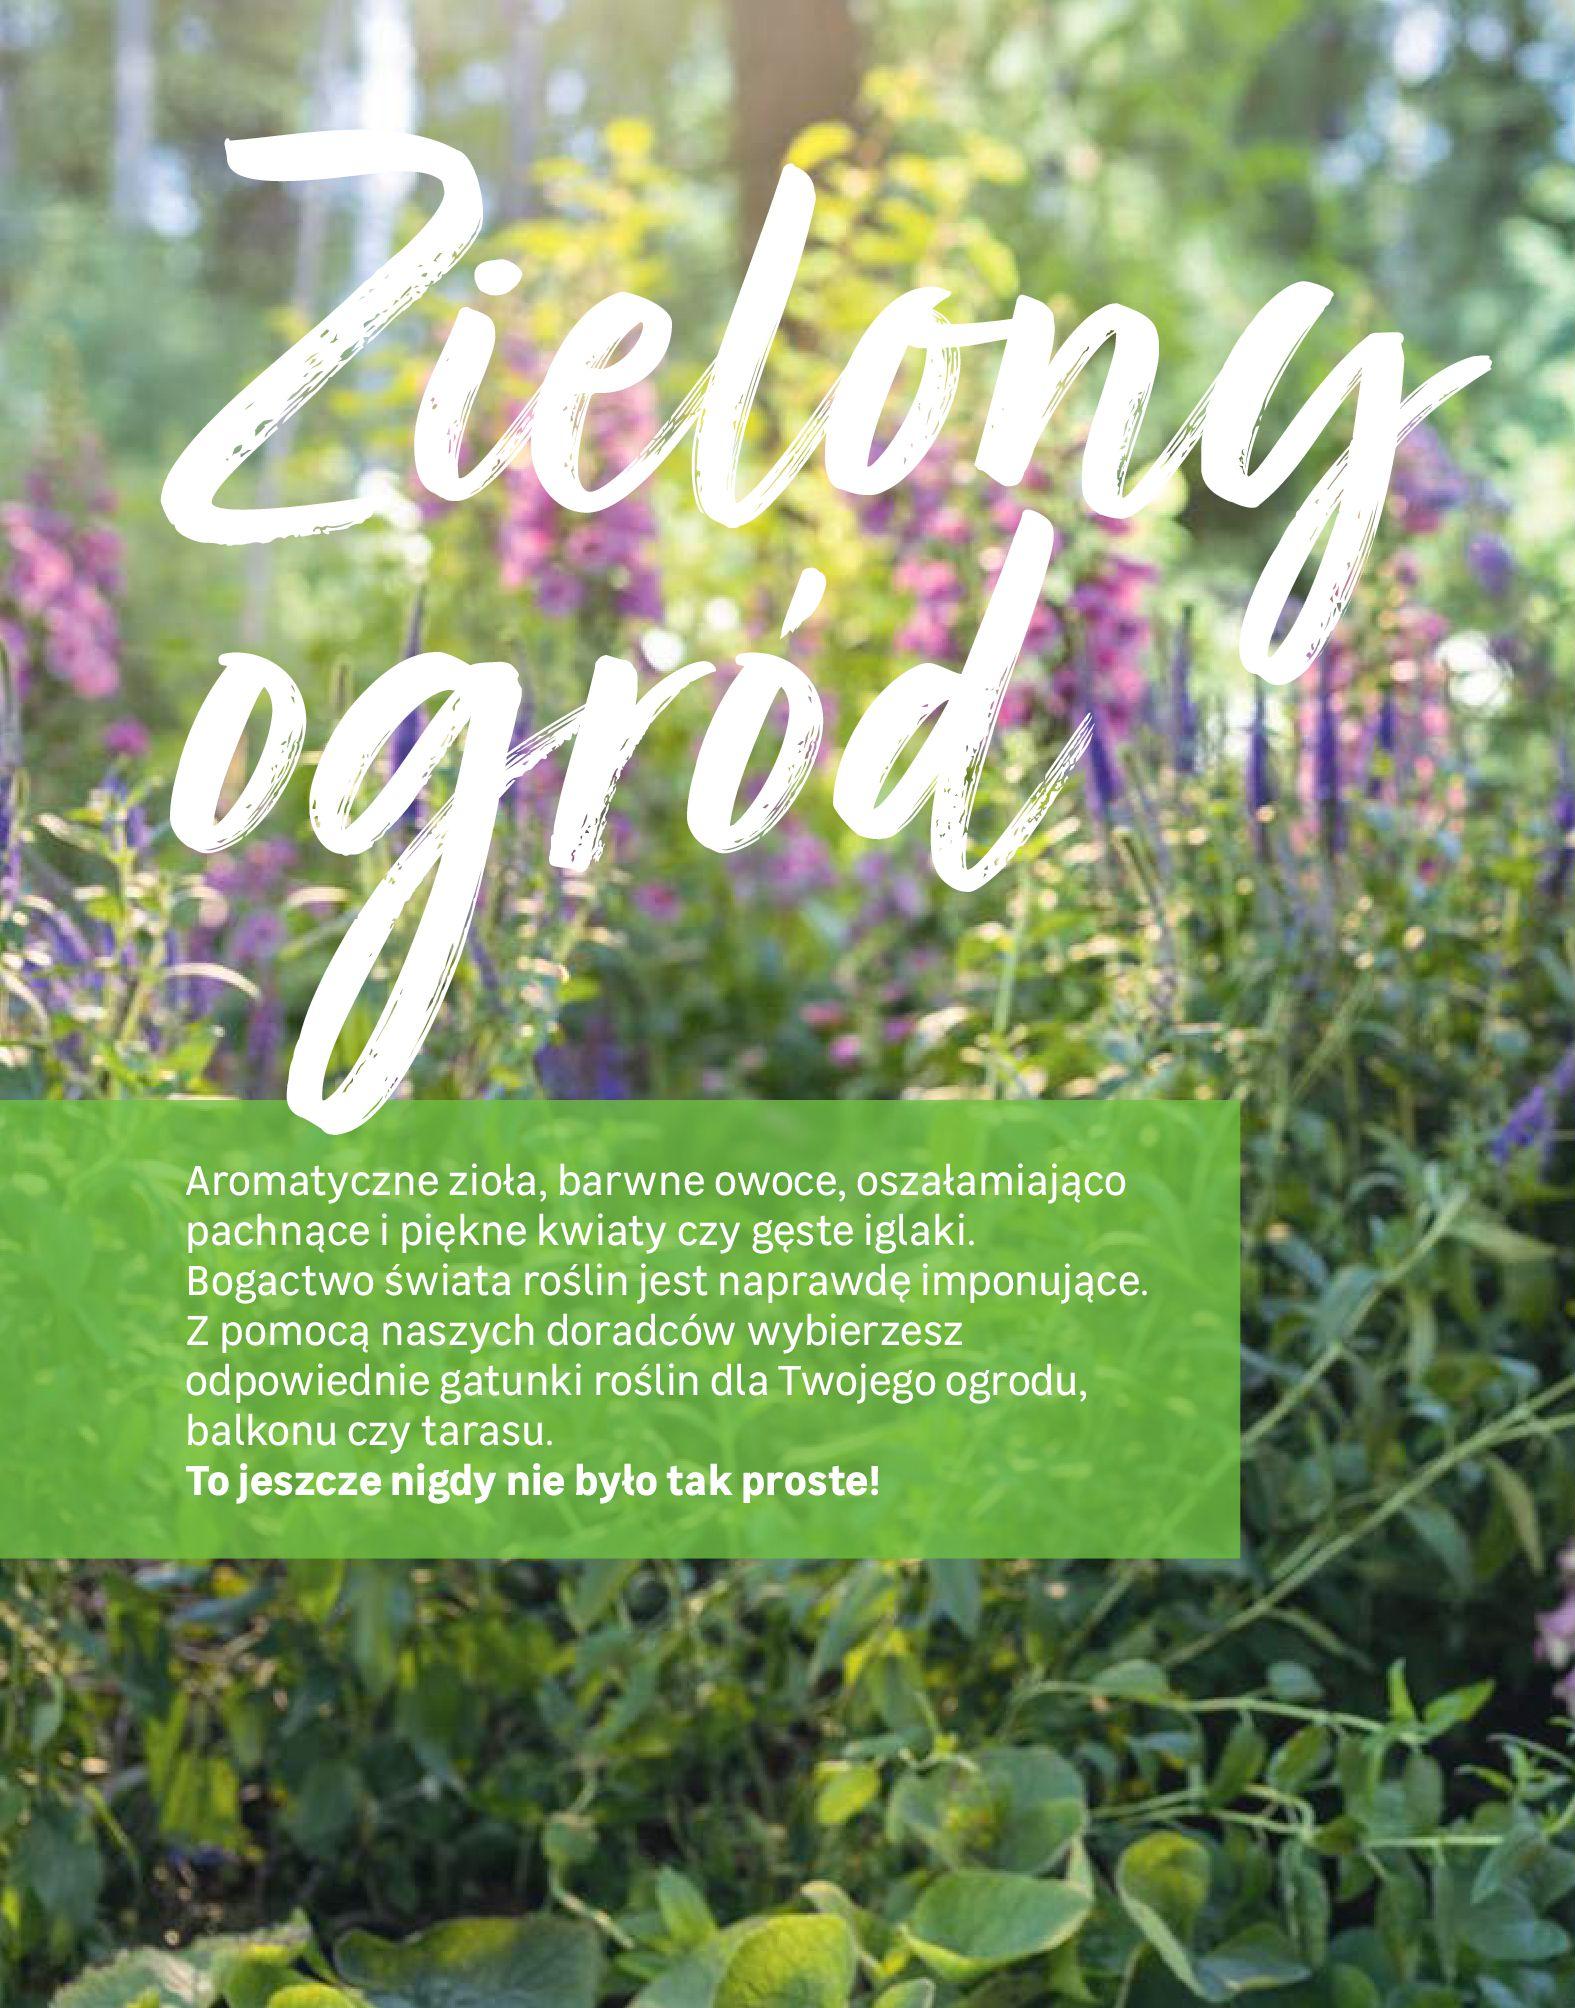 Gazetka Leroy Merlin: Katalog Ogród 2021-03-10 page-84